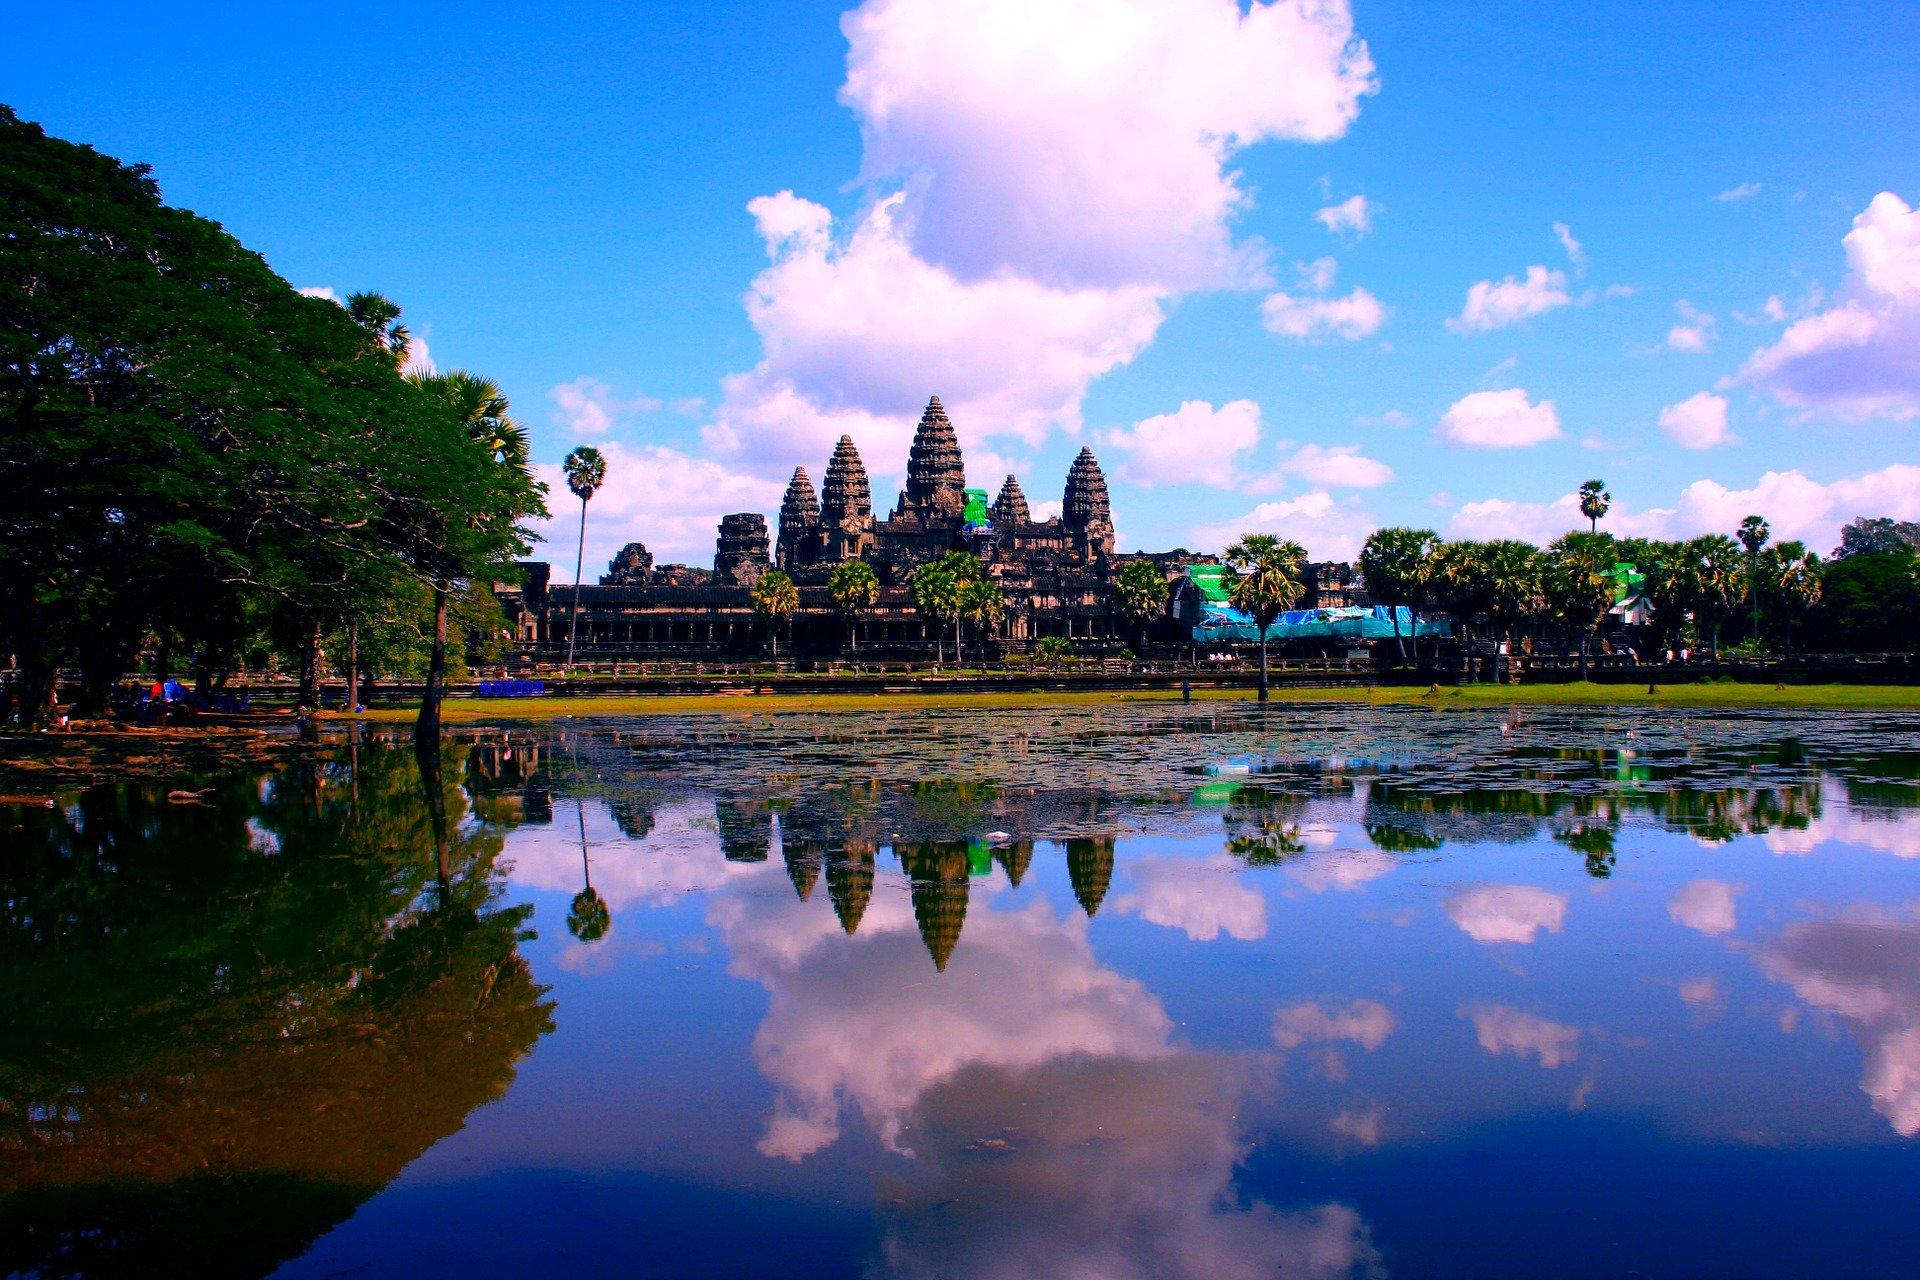 Cambogia ankor-wat